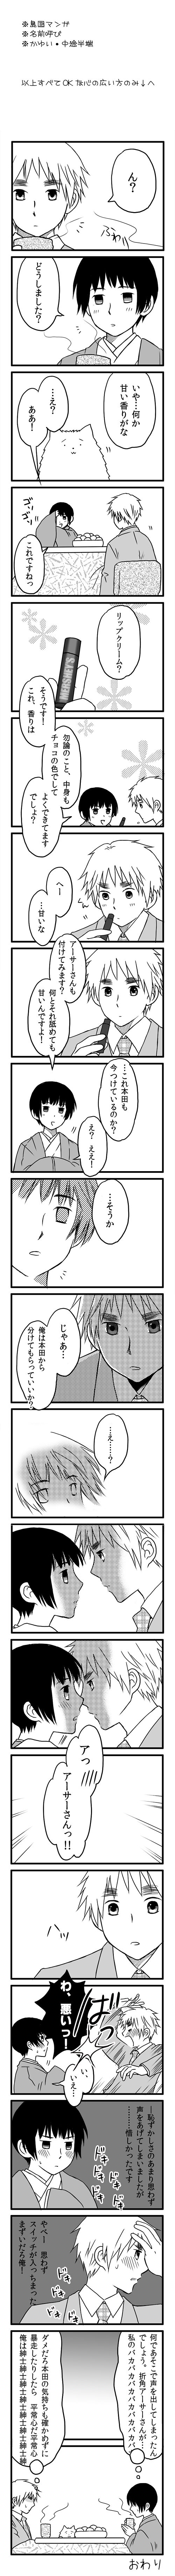 Tags: Anime, Axis Powers: Hetalia, United Kingdom, Japan, Pochi-kun, Kotatsu, Asian Countries, Axis Power Countries, Allied Forces